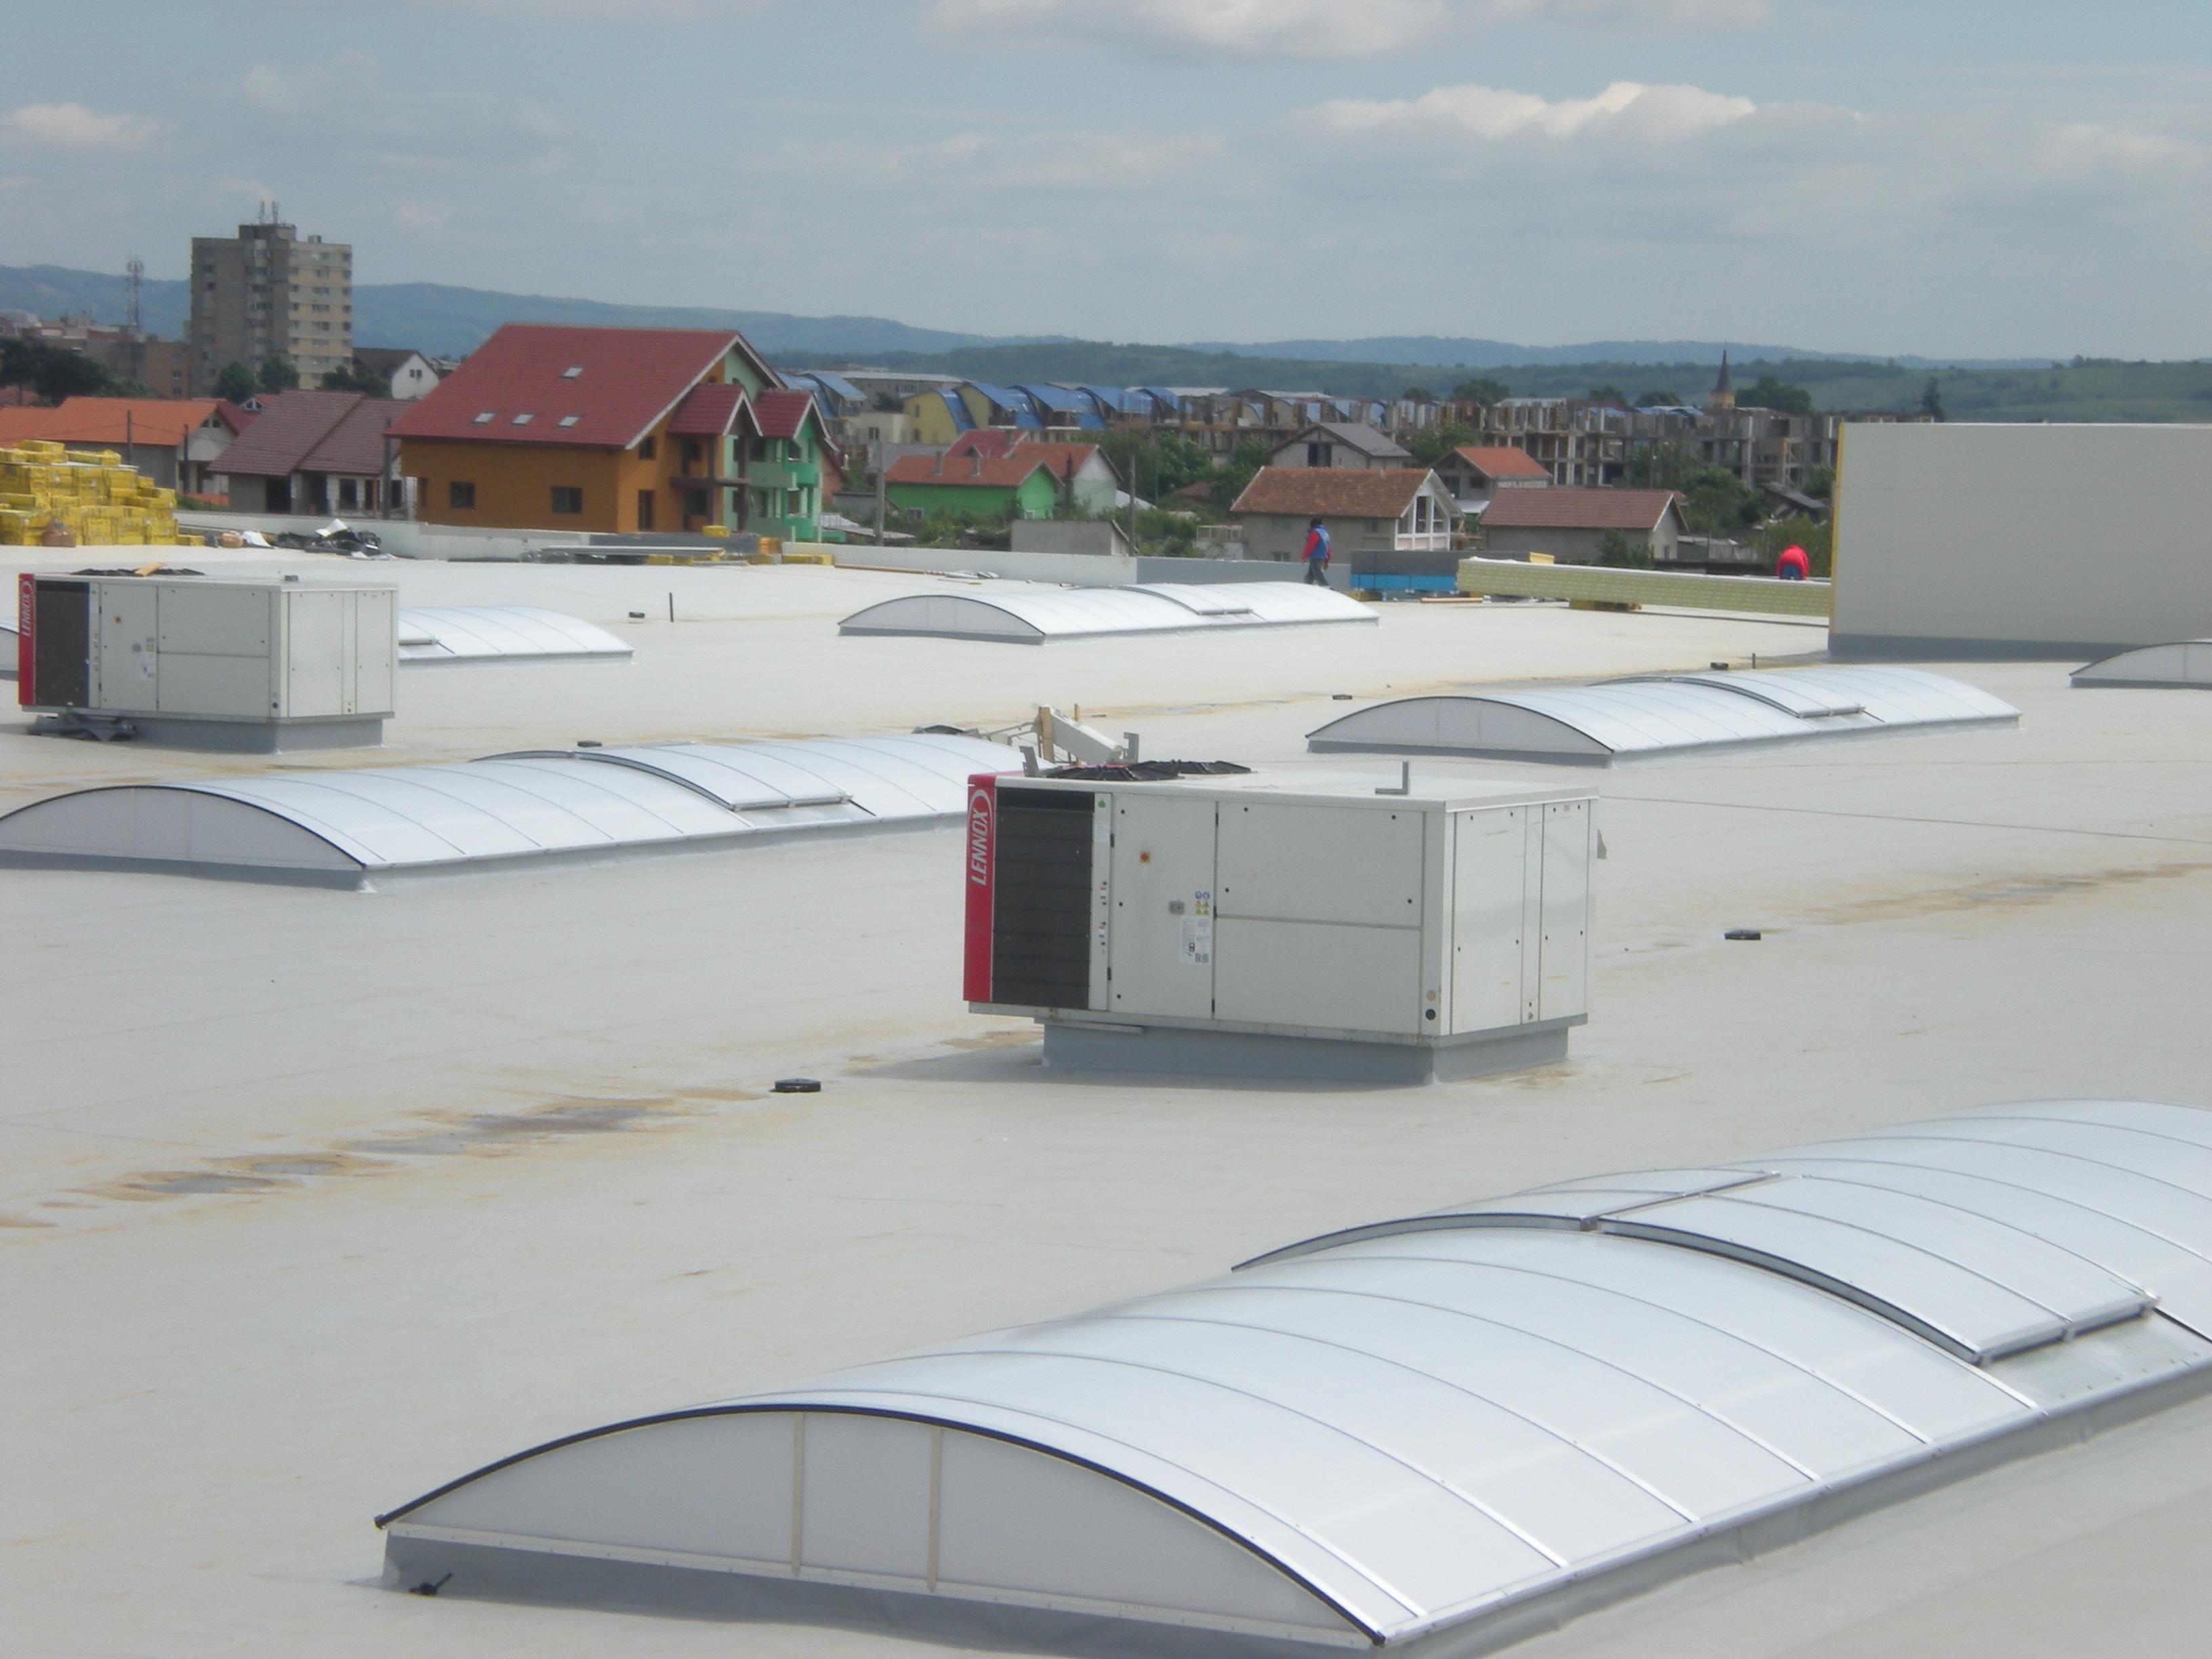 Luminatoare industriale - Spatiu comercial Carrefour - Drobeta Turnu Severin HEXADOME - Poza 1